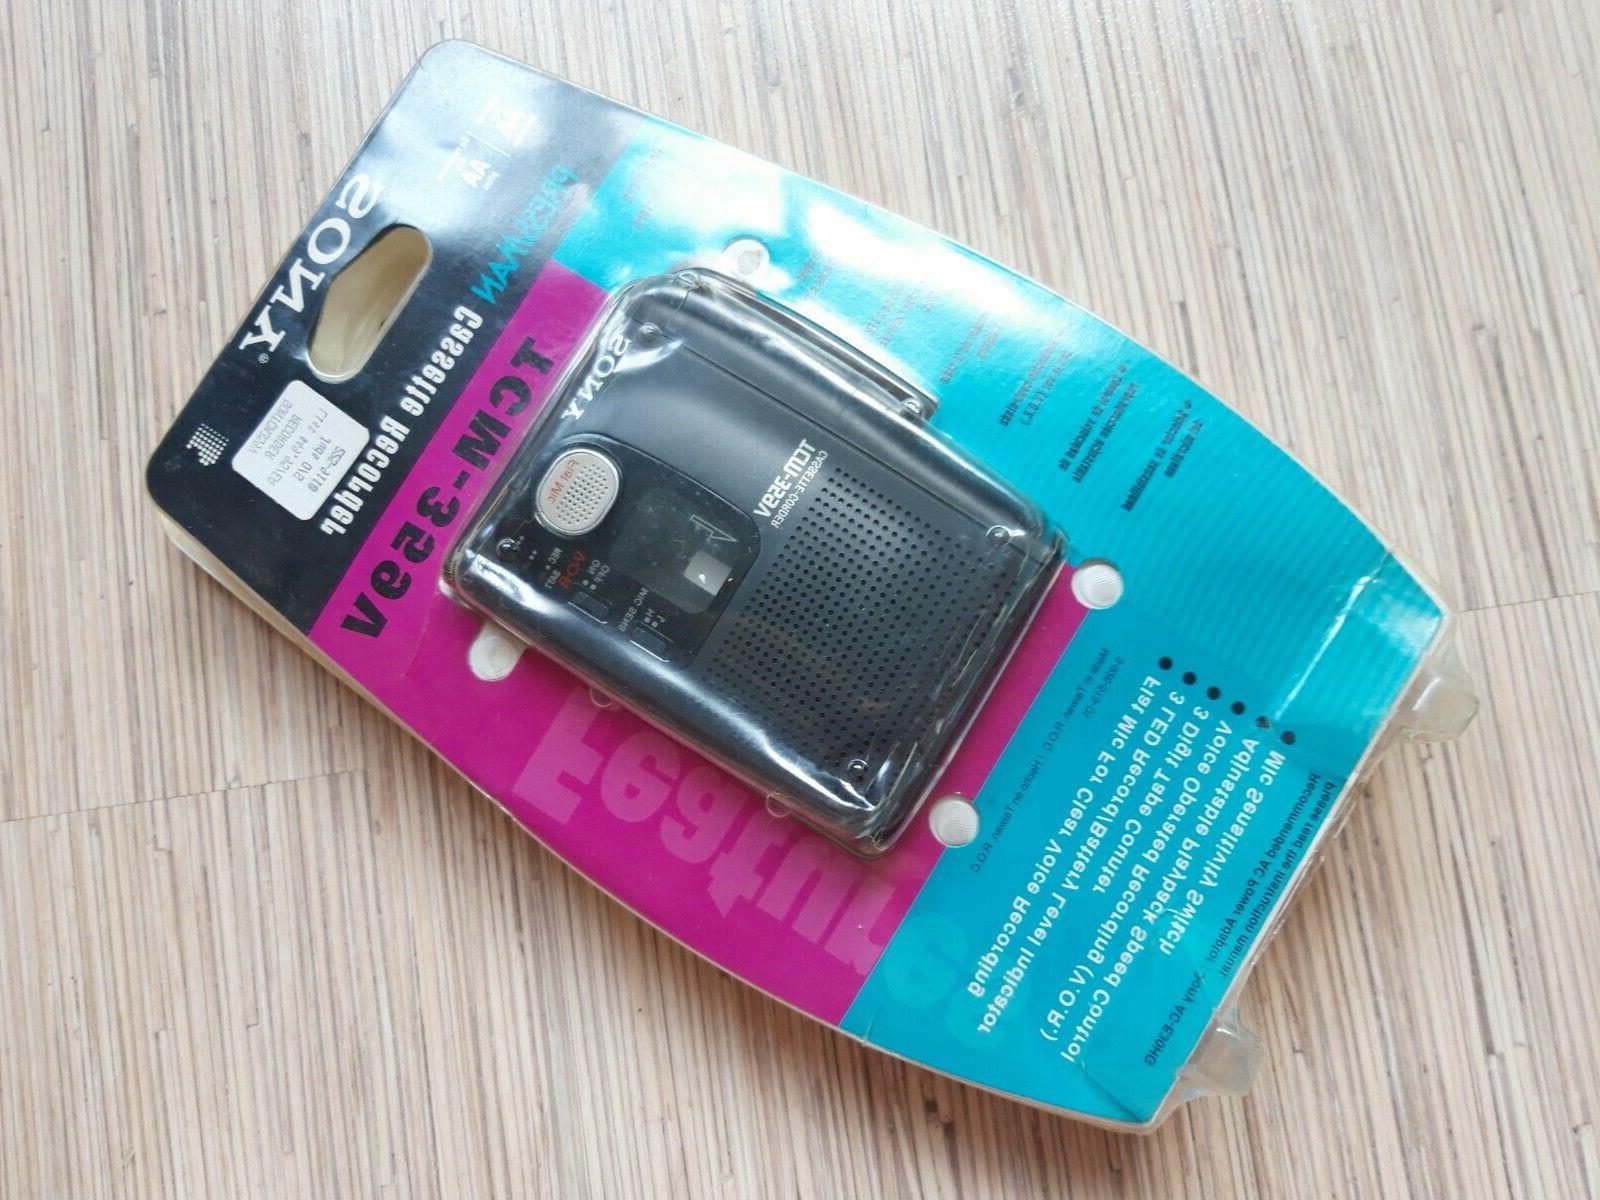 Sony TCM-359V Portable Personal Flat